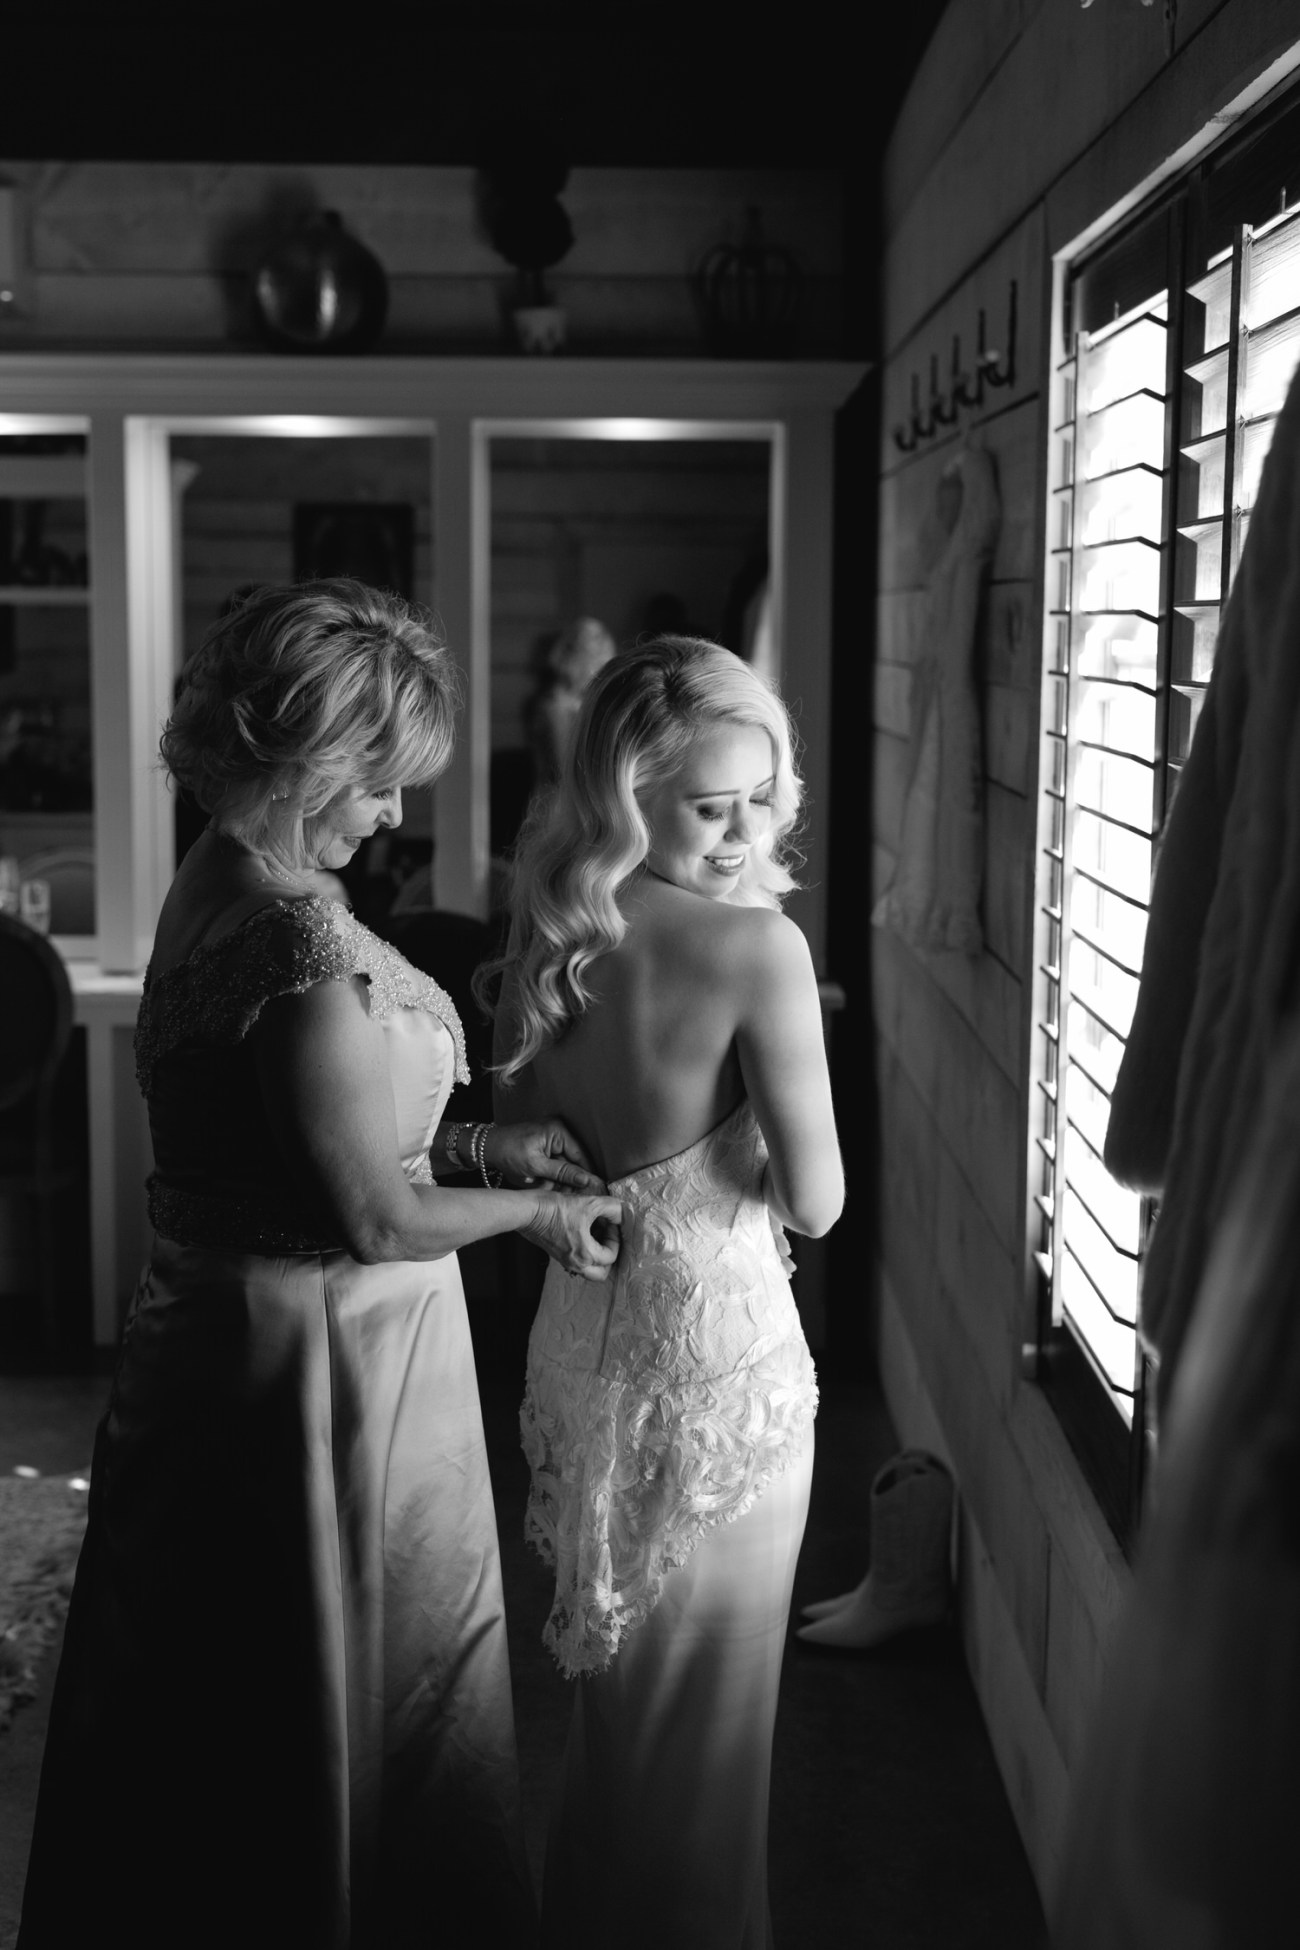 eberley brooks events bride